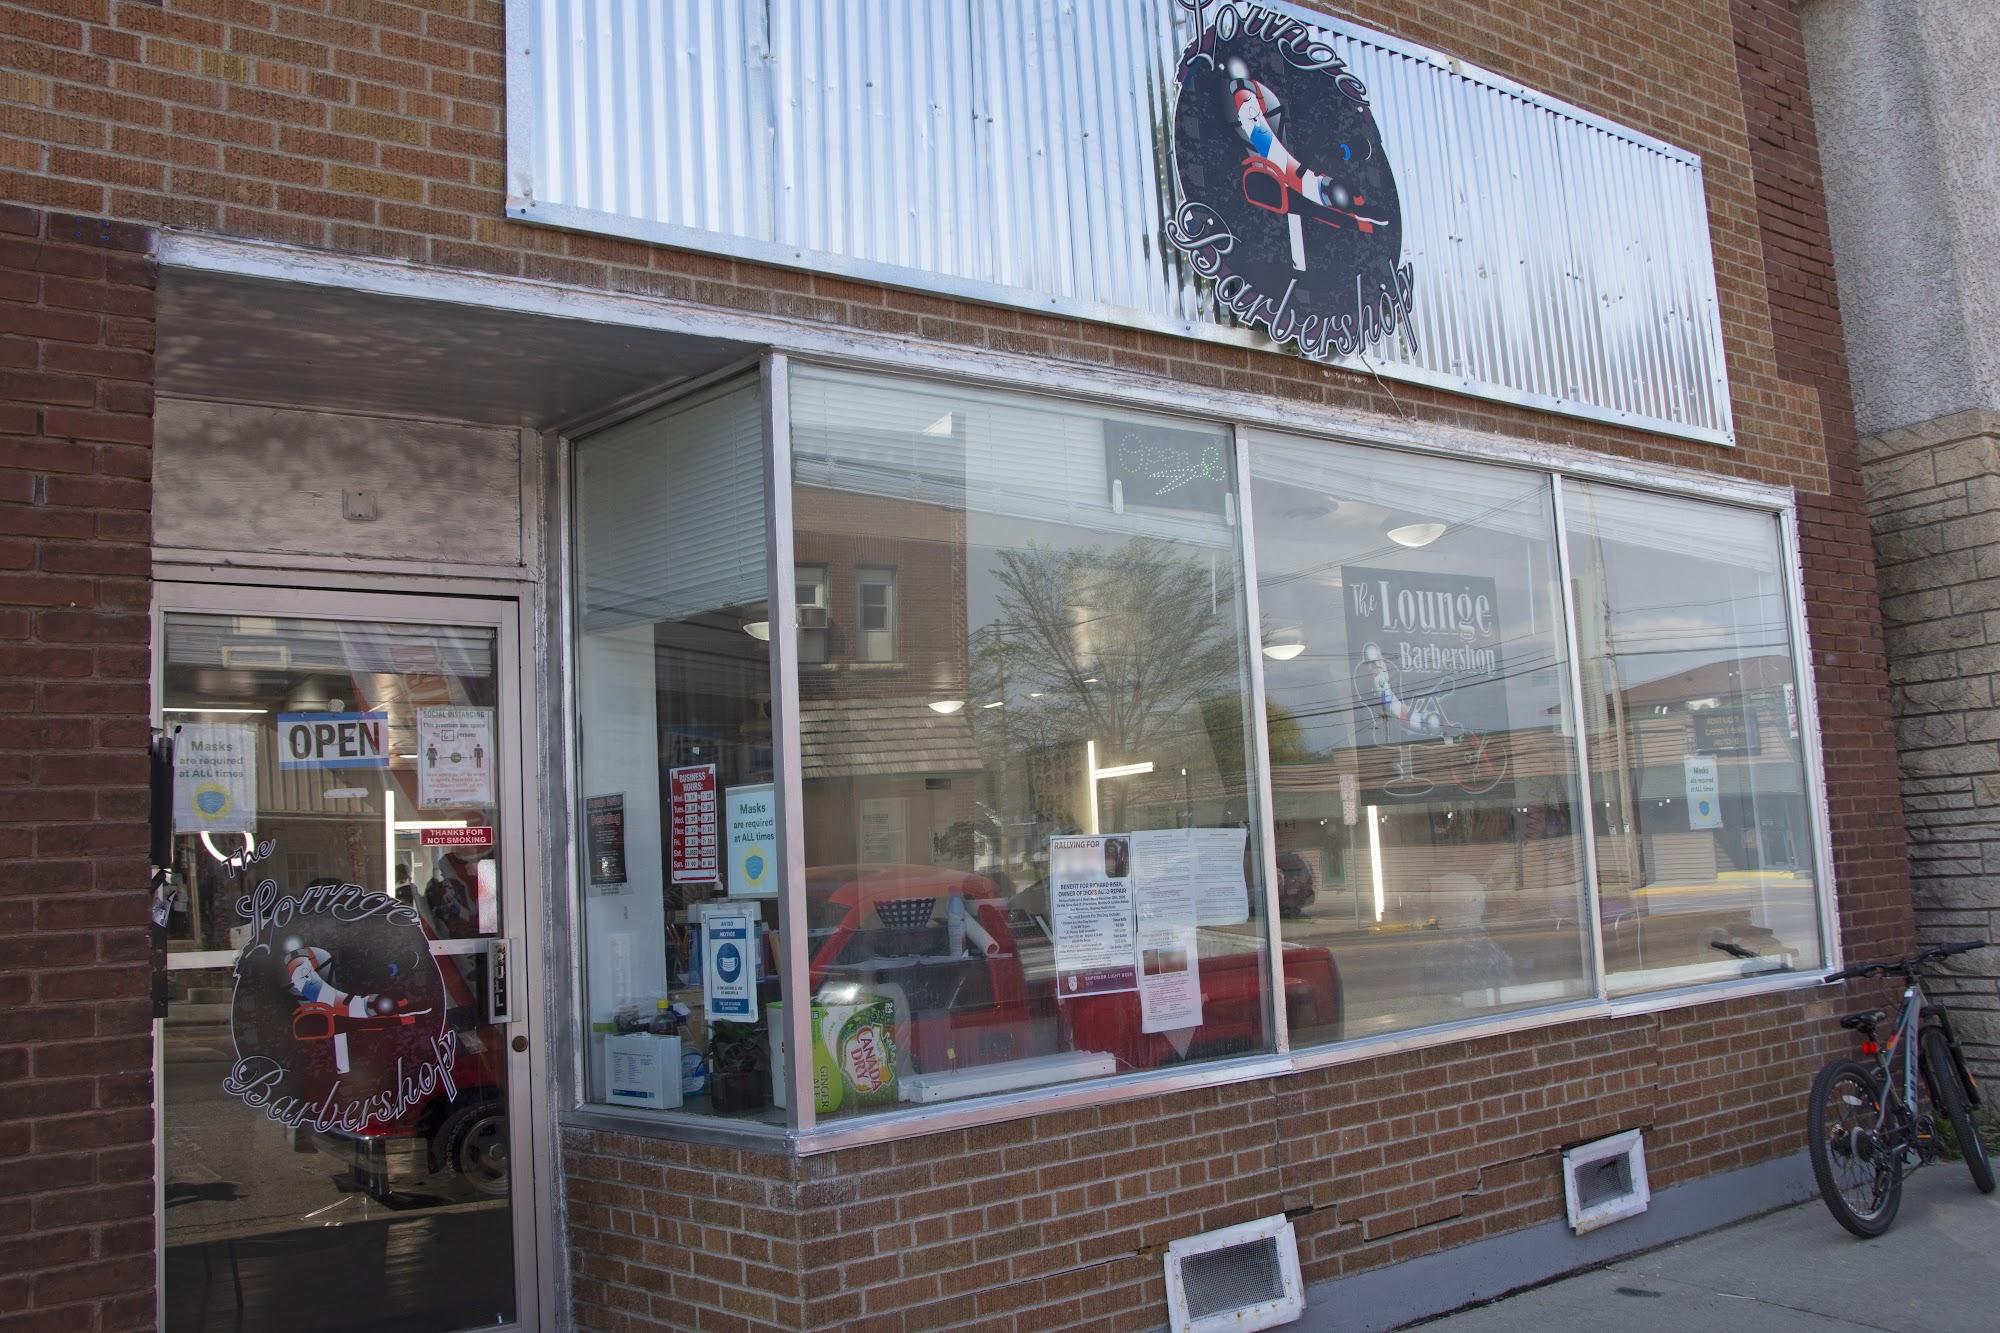 The lounge barbershop 319 W Main St, Arcadia